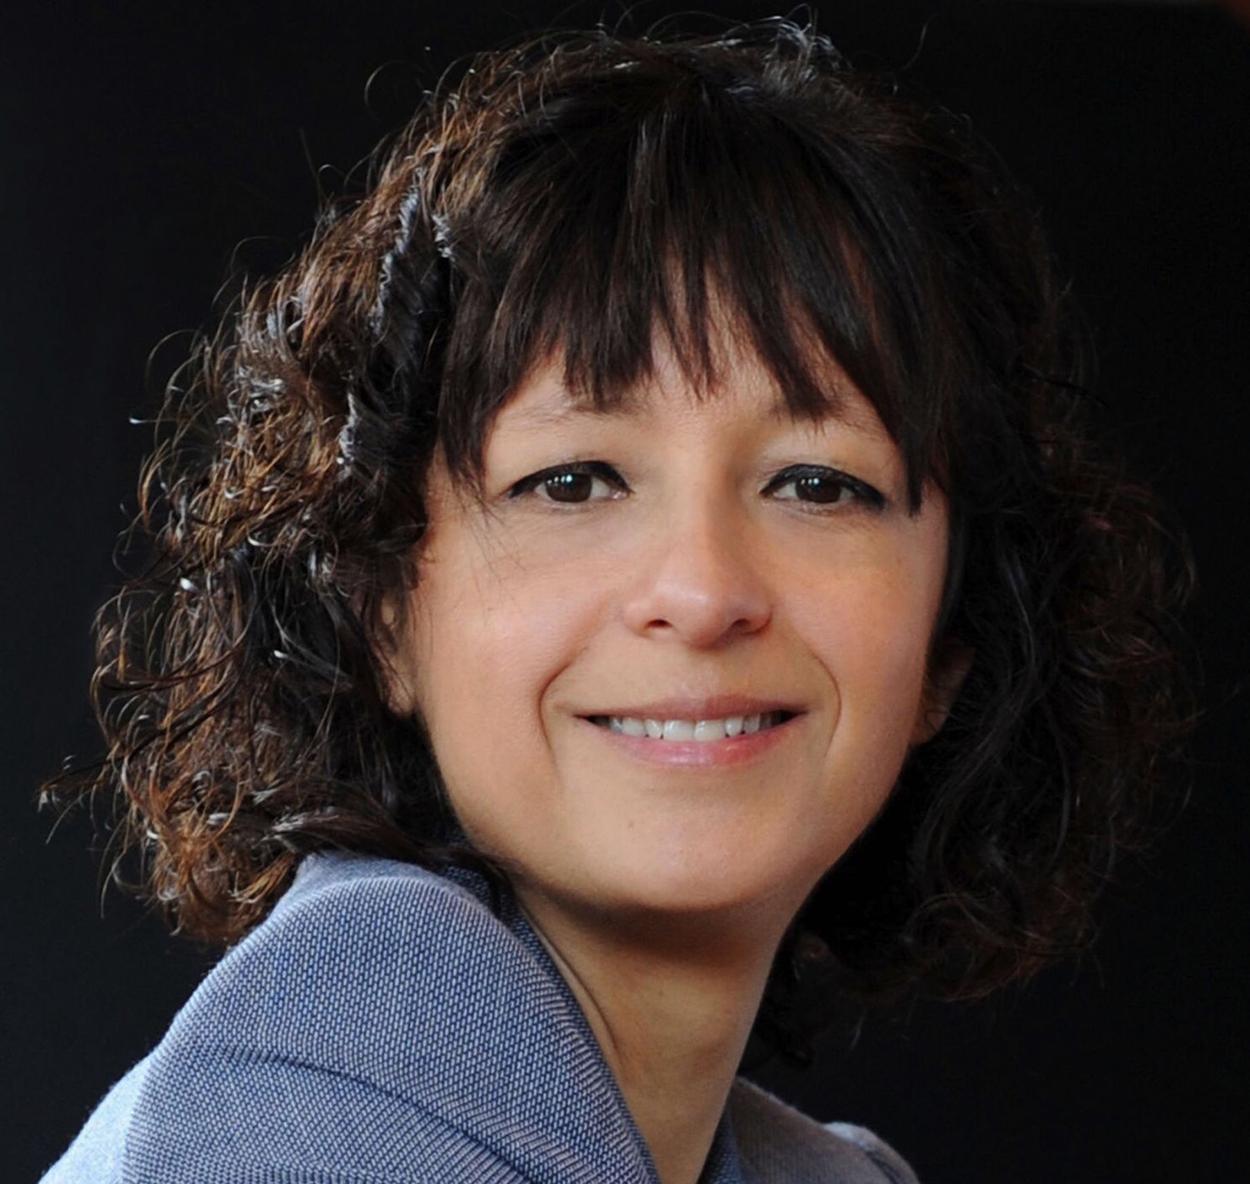 image of Emmanuelle Charpentier